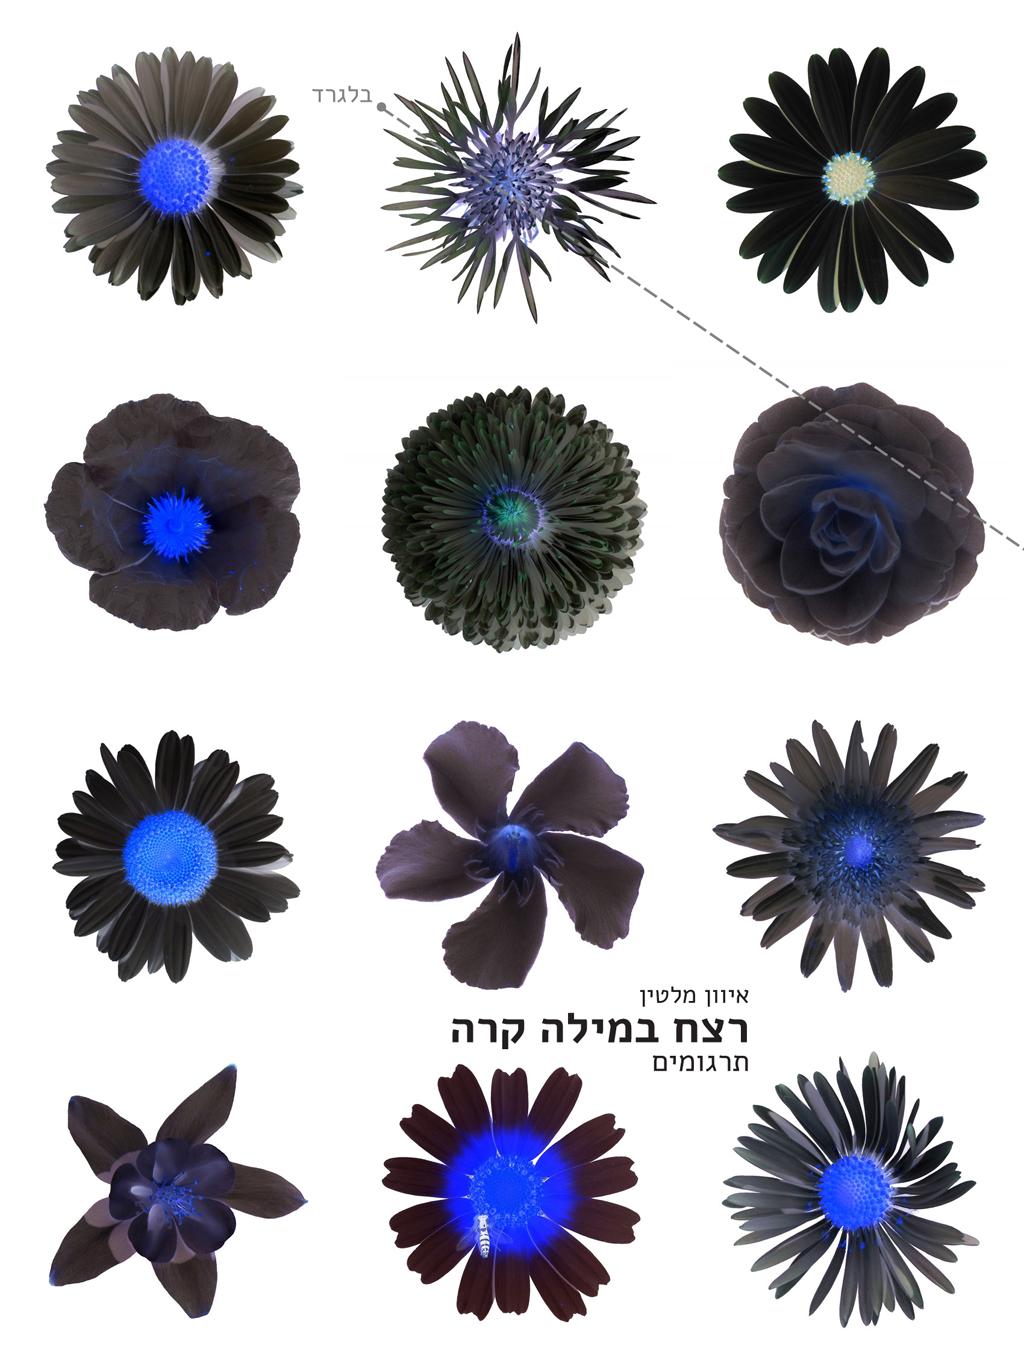 https://altneu.me/work.me/upload/image/retzah-bemila-kara-2020-cover-out.png